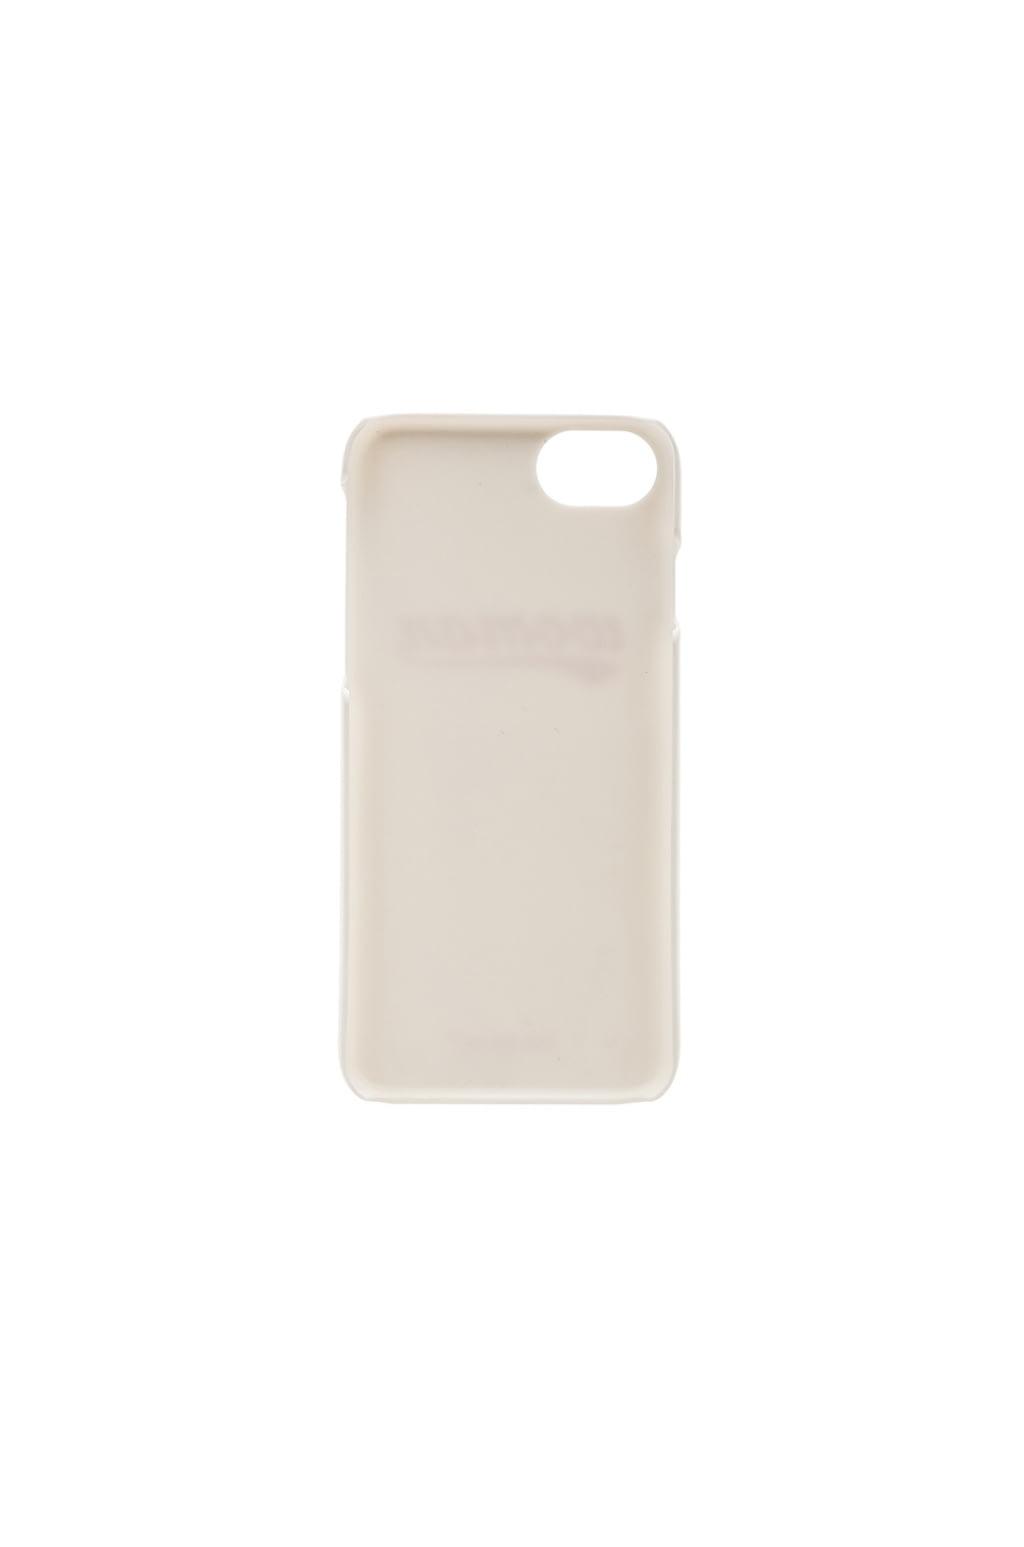 Woman Logo iPhone 7/8 Case in White Off-white YgYwJQmGSi